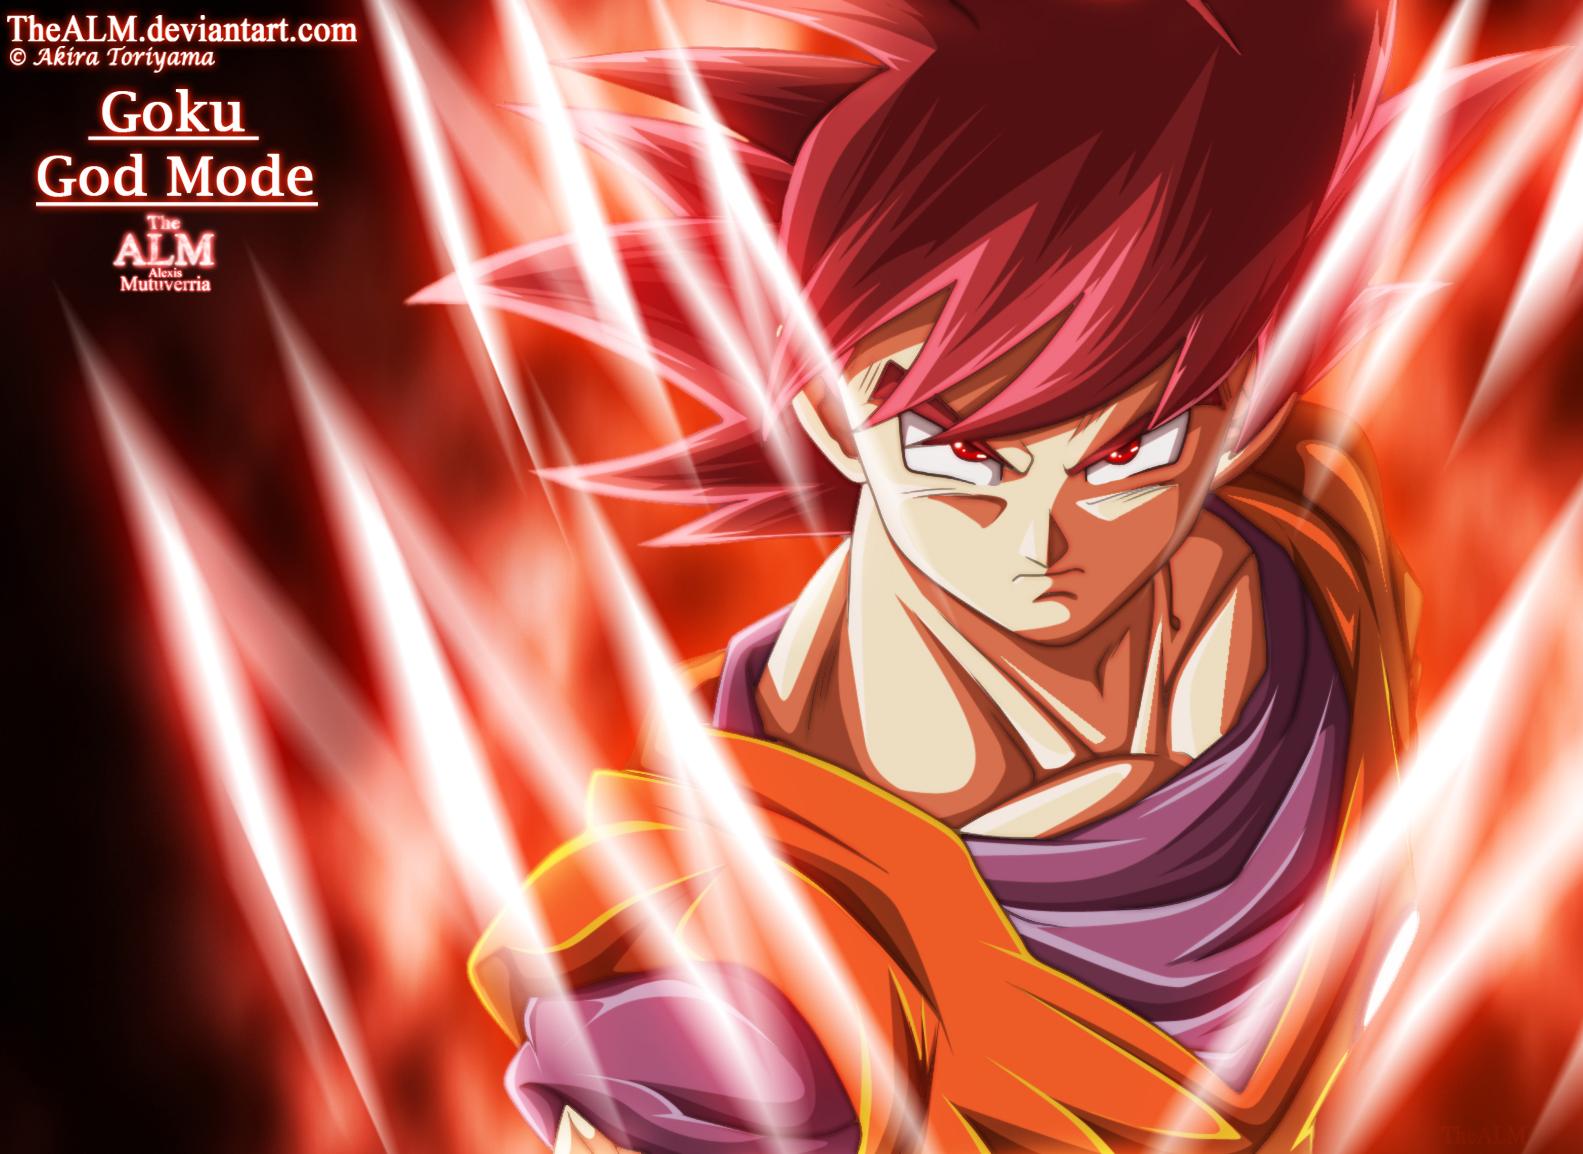 Goku God Mode by TheALMGoku